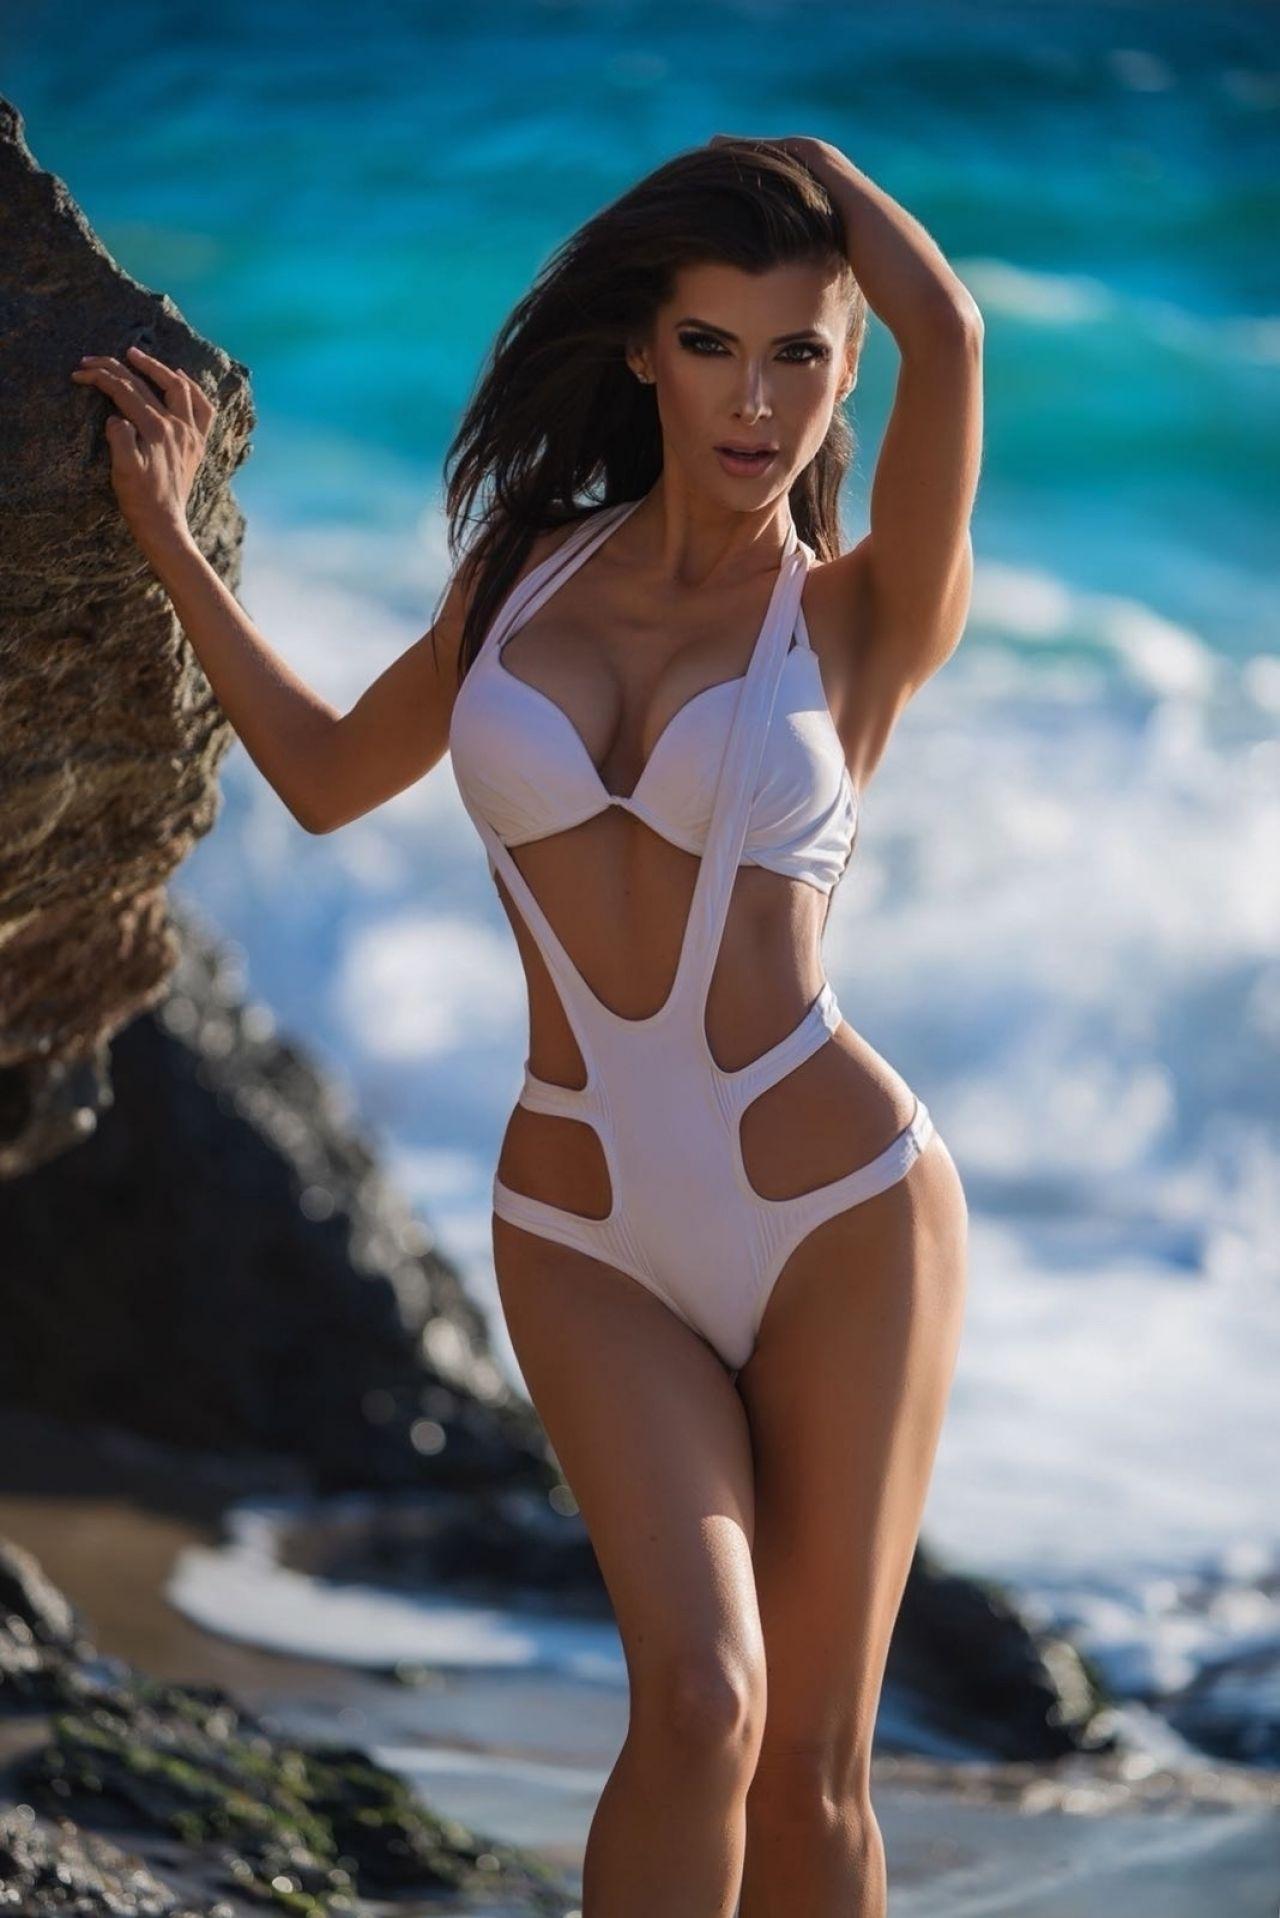 Video Ildiko Ferenczi nudes (11 photos), Topless, Sideboobs, Selfie, cameltoe 2020